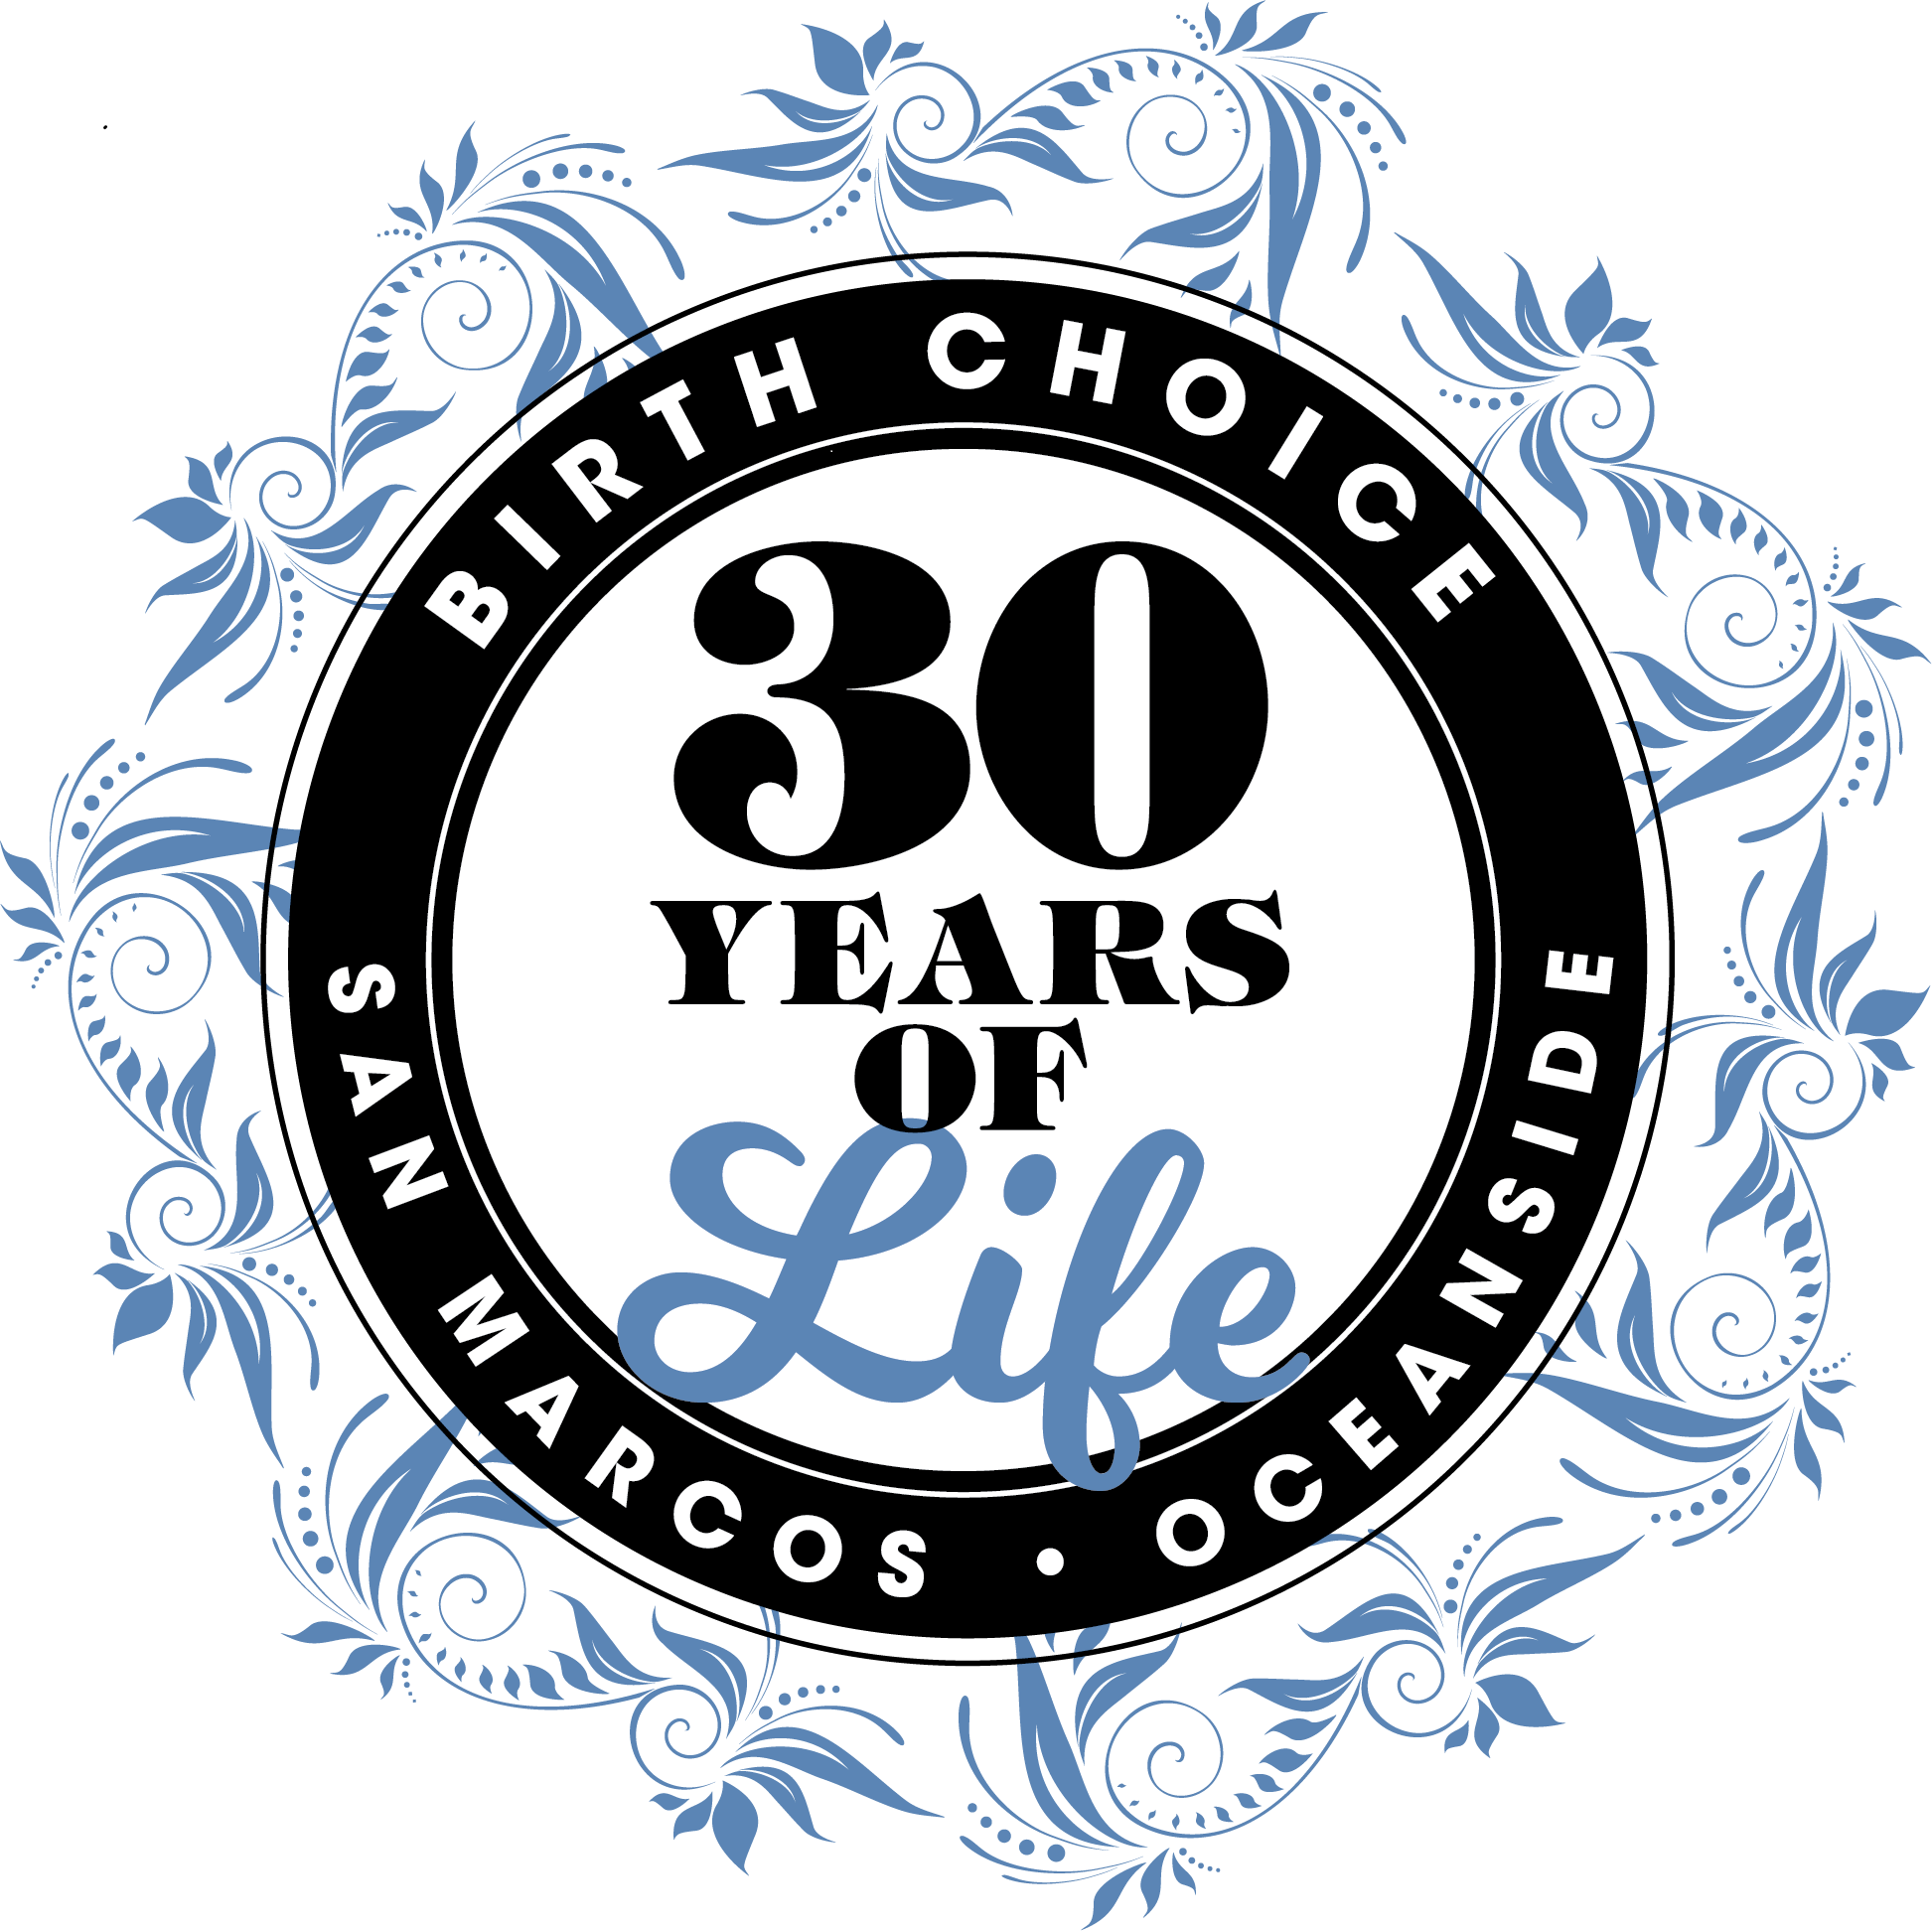 Bc 30th logo